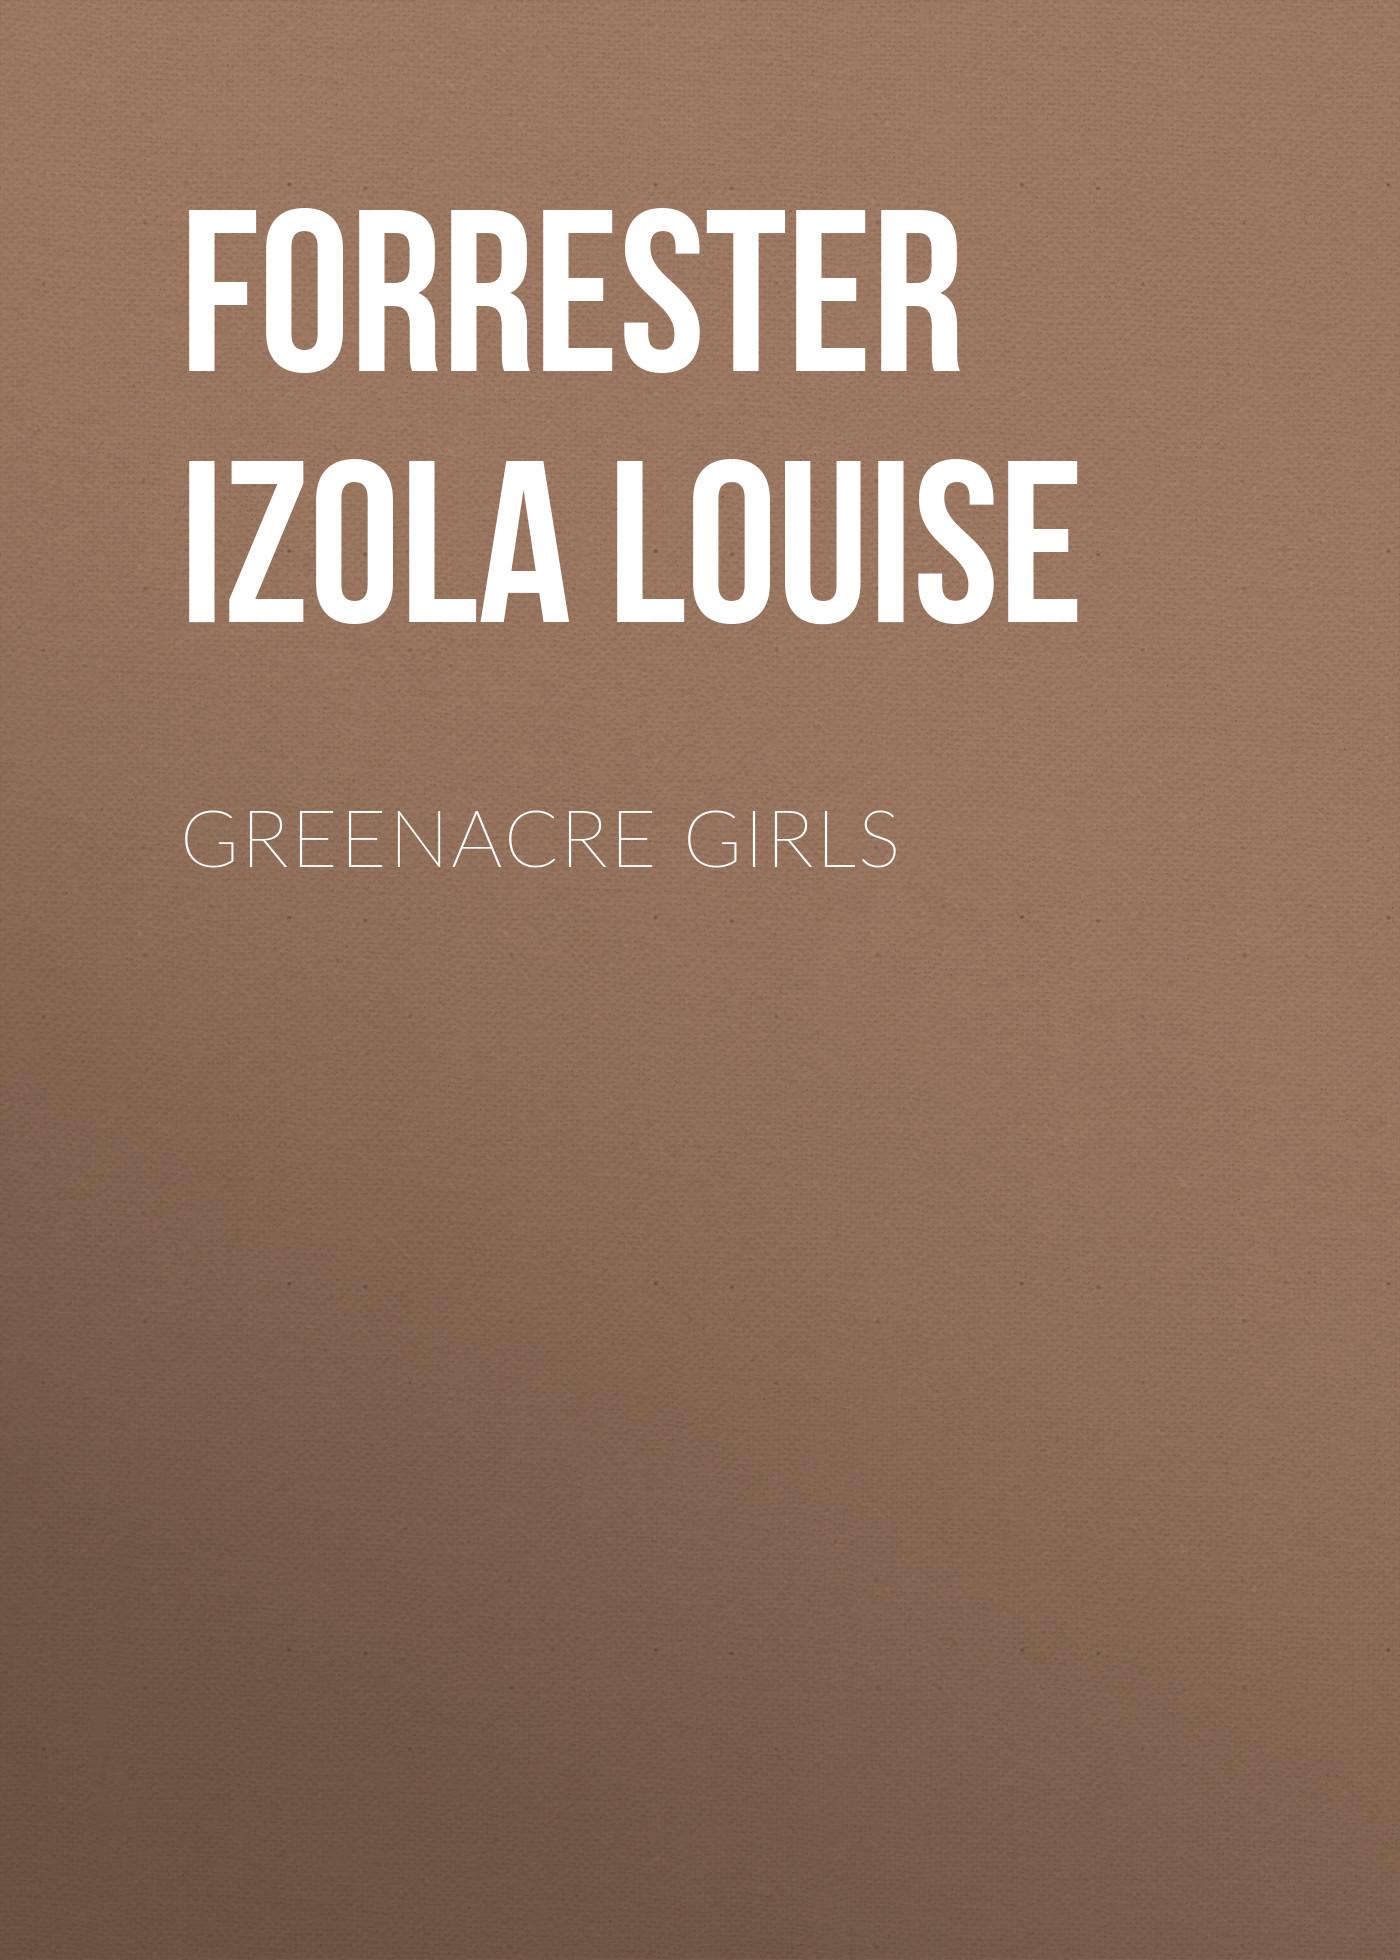 Forrester Izola Louise Greenacre Girls